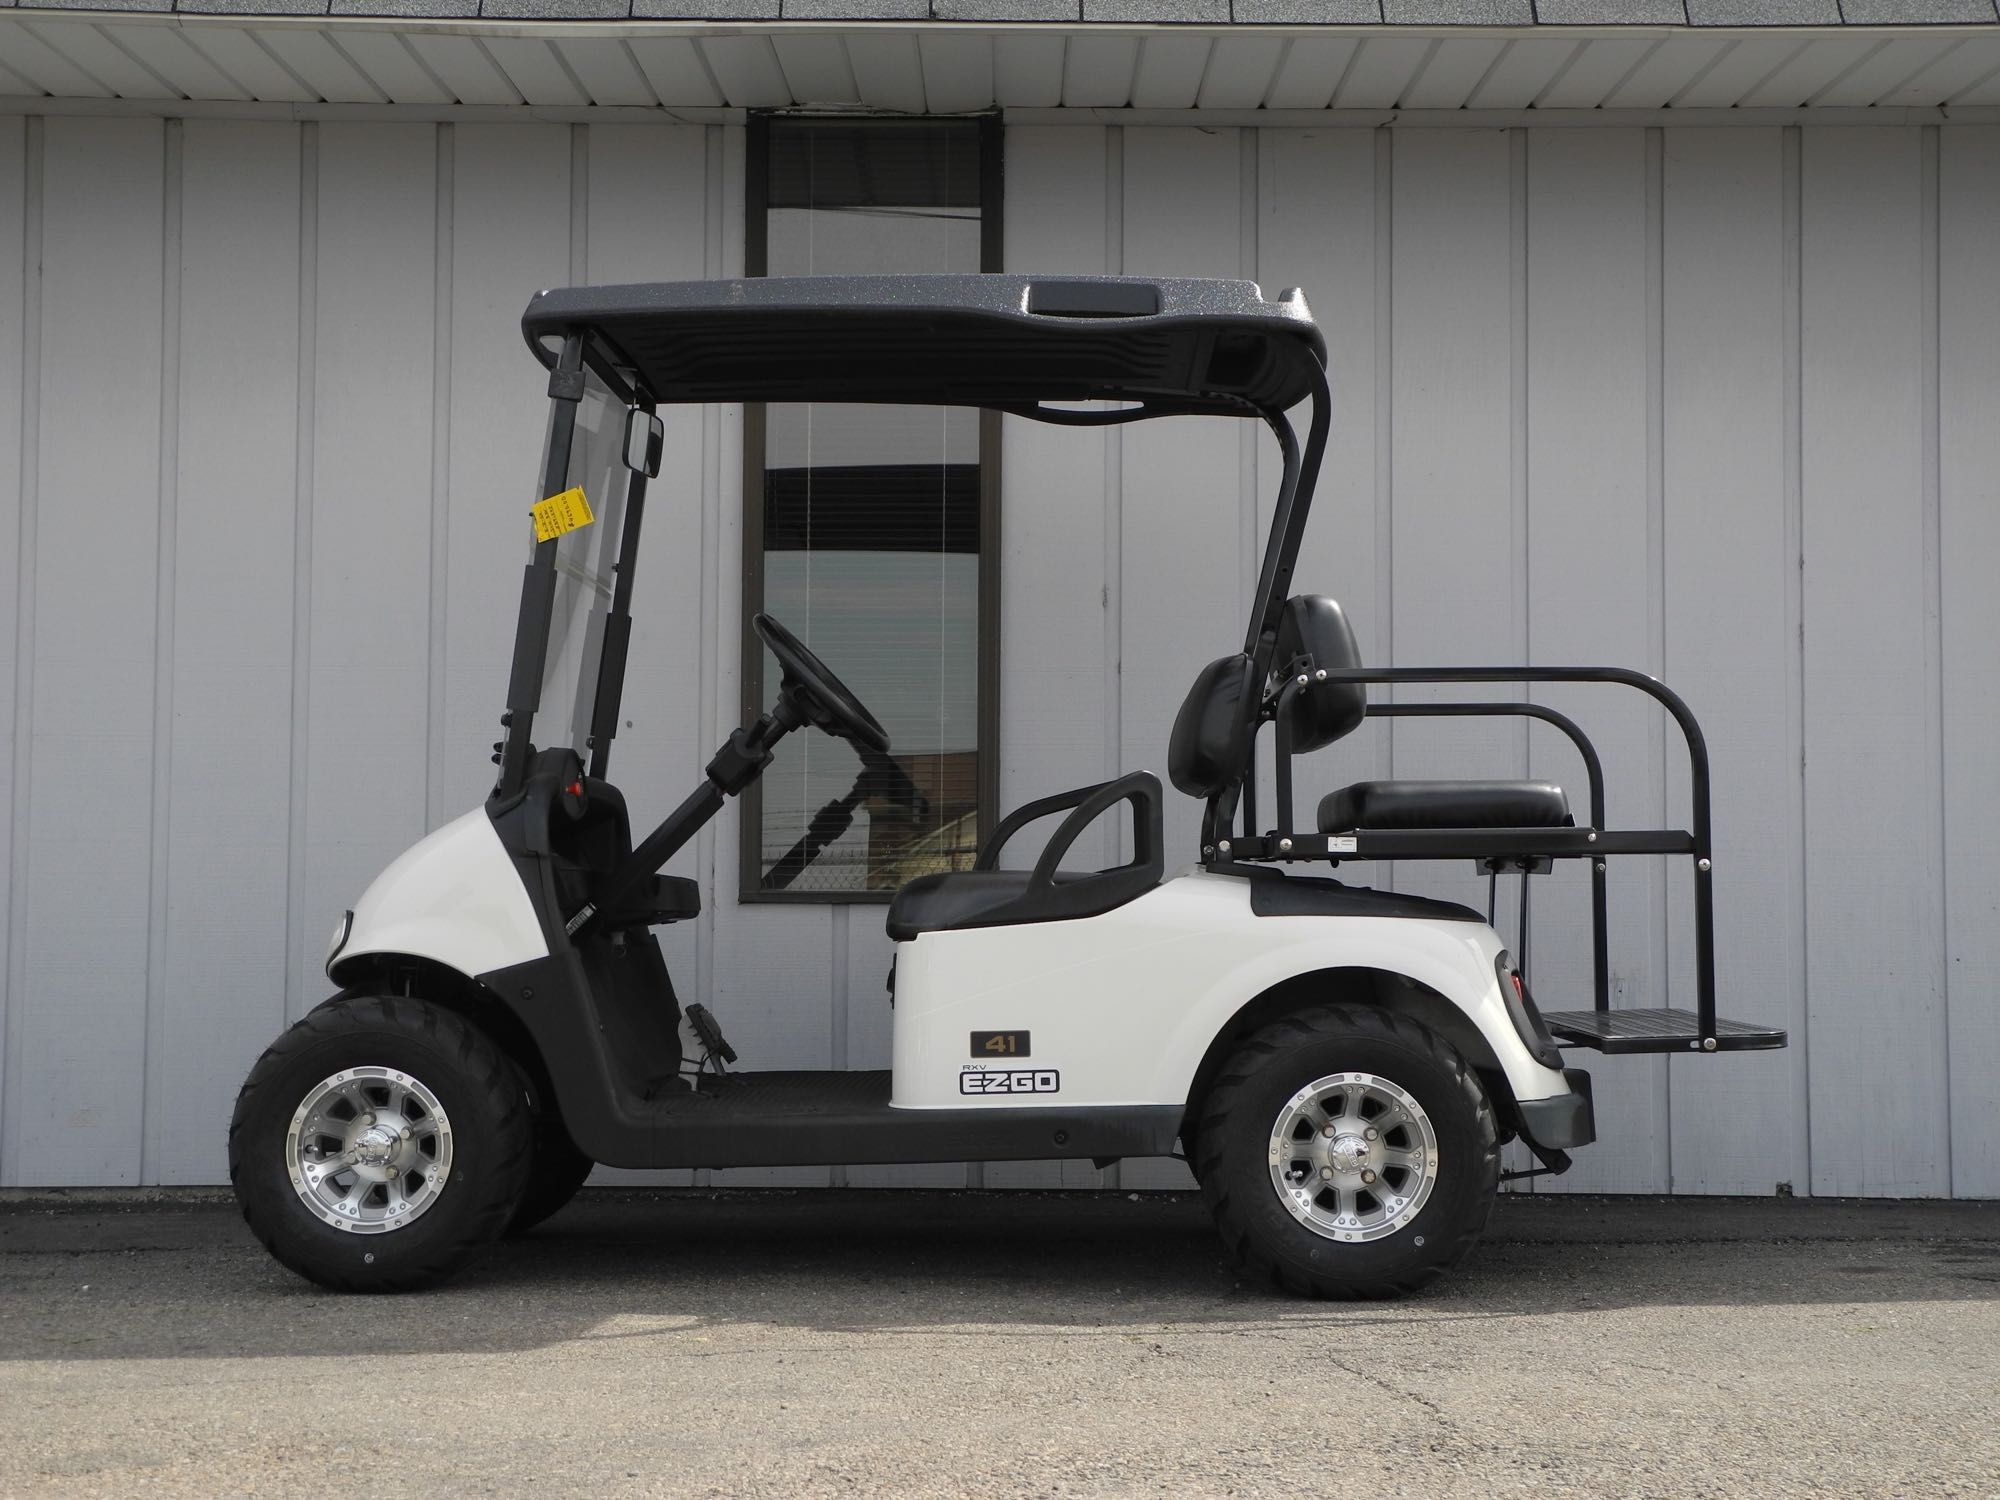 This 2010 E-Z-GO RXV electric golf car is street ready with premium Battery Powered Golf Carts Ez Go Seat on ez go golf carts chargers, ez golf cart batteries, ez go powerwise battery charger, 36 volt battery, forklift battery, trojan t-105 6v battery, ez go bike battery, ez go panama city,